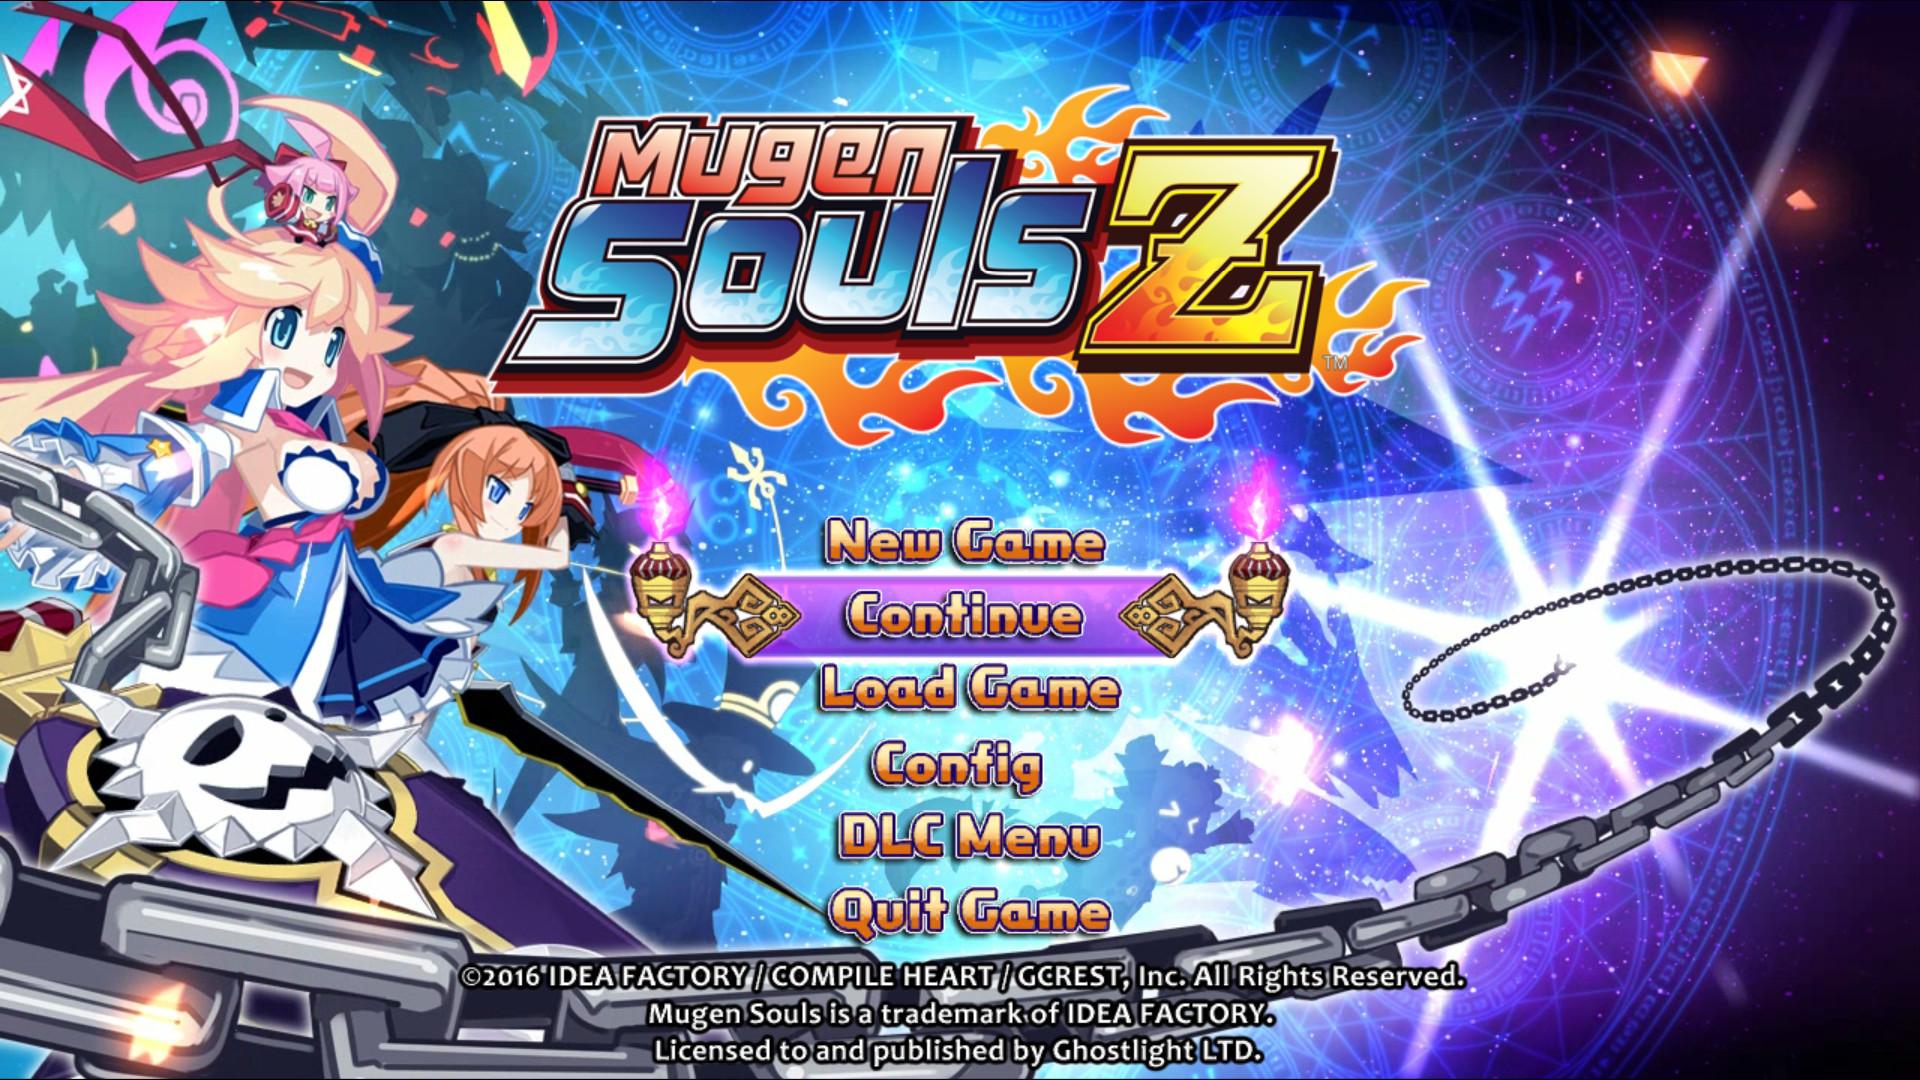 Mugen Souls Z - Overwhelming Weapon Bundle screenshot